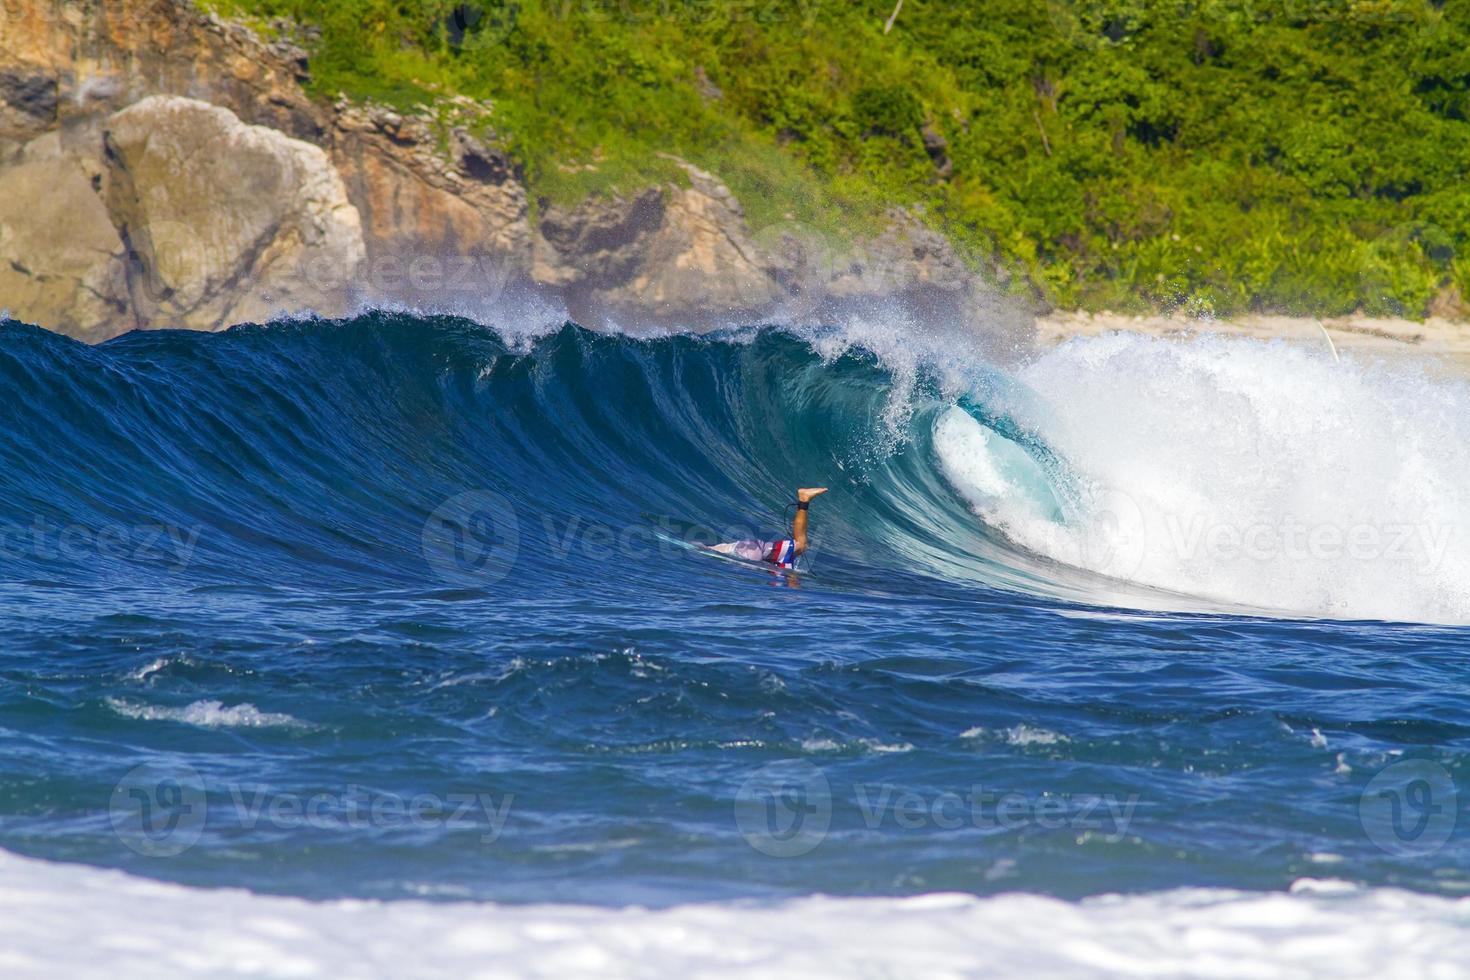 olas oceánicas.lombok island.indonesia. foto